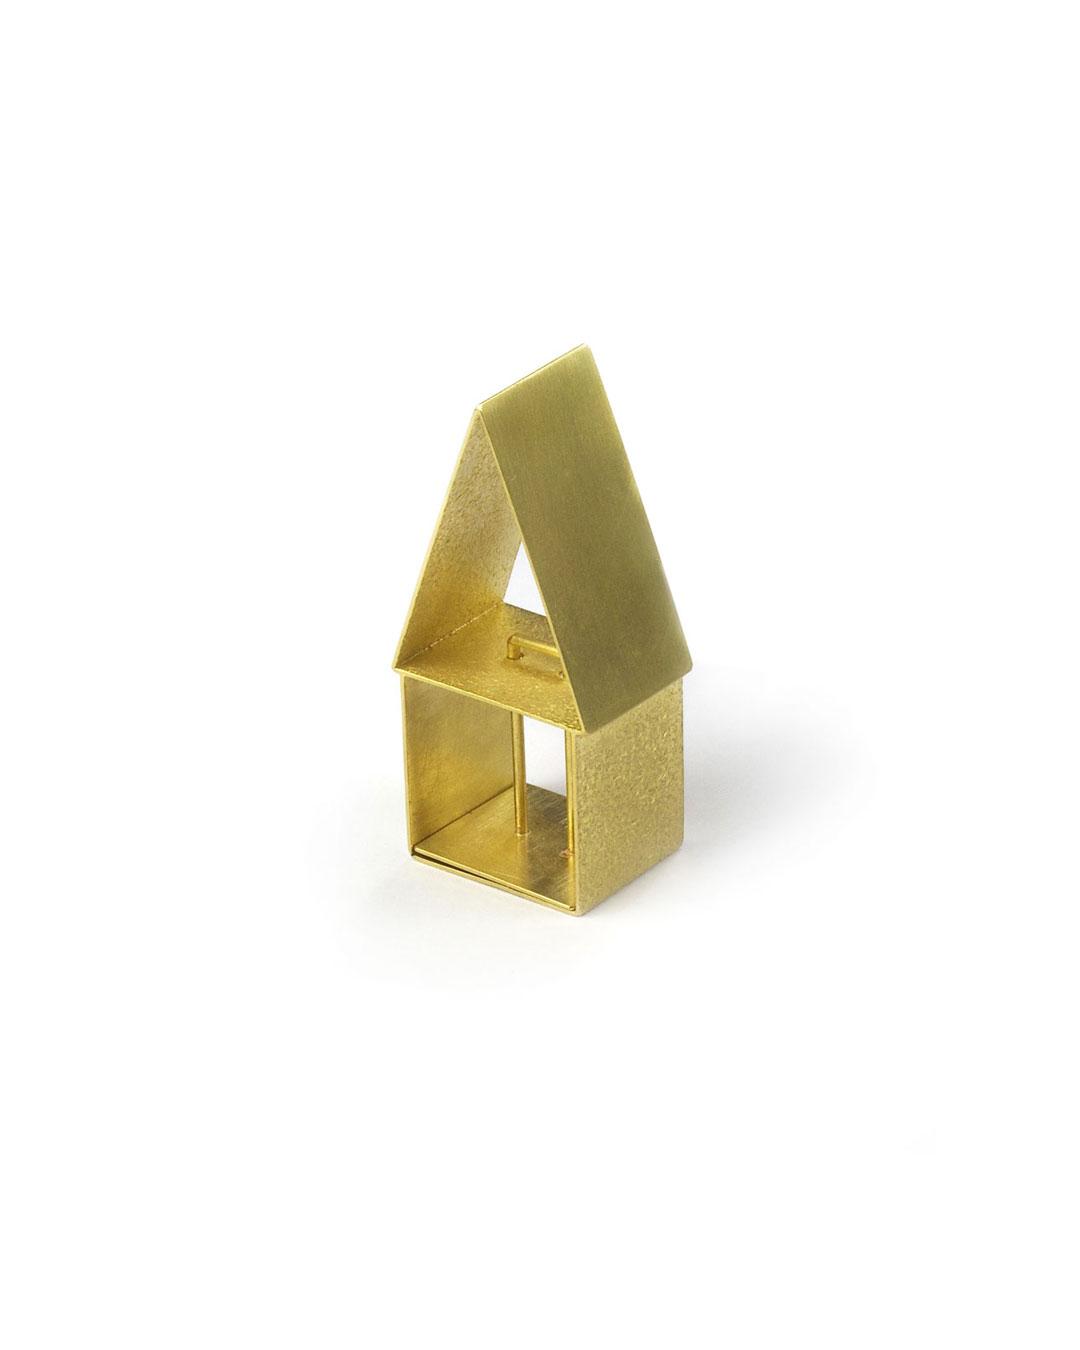 Okinari Kurokawa, untitled, 2006, ring; 20ct gold, 42 x 20 x 14 mm